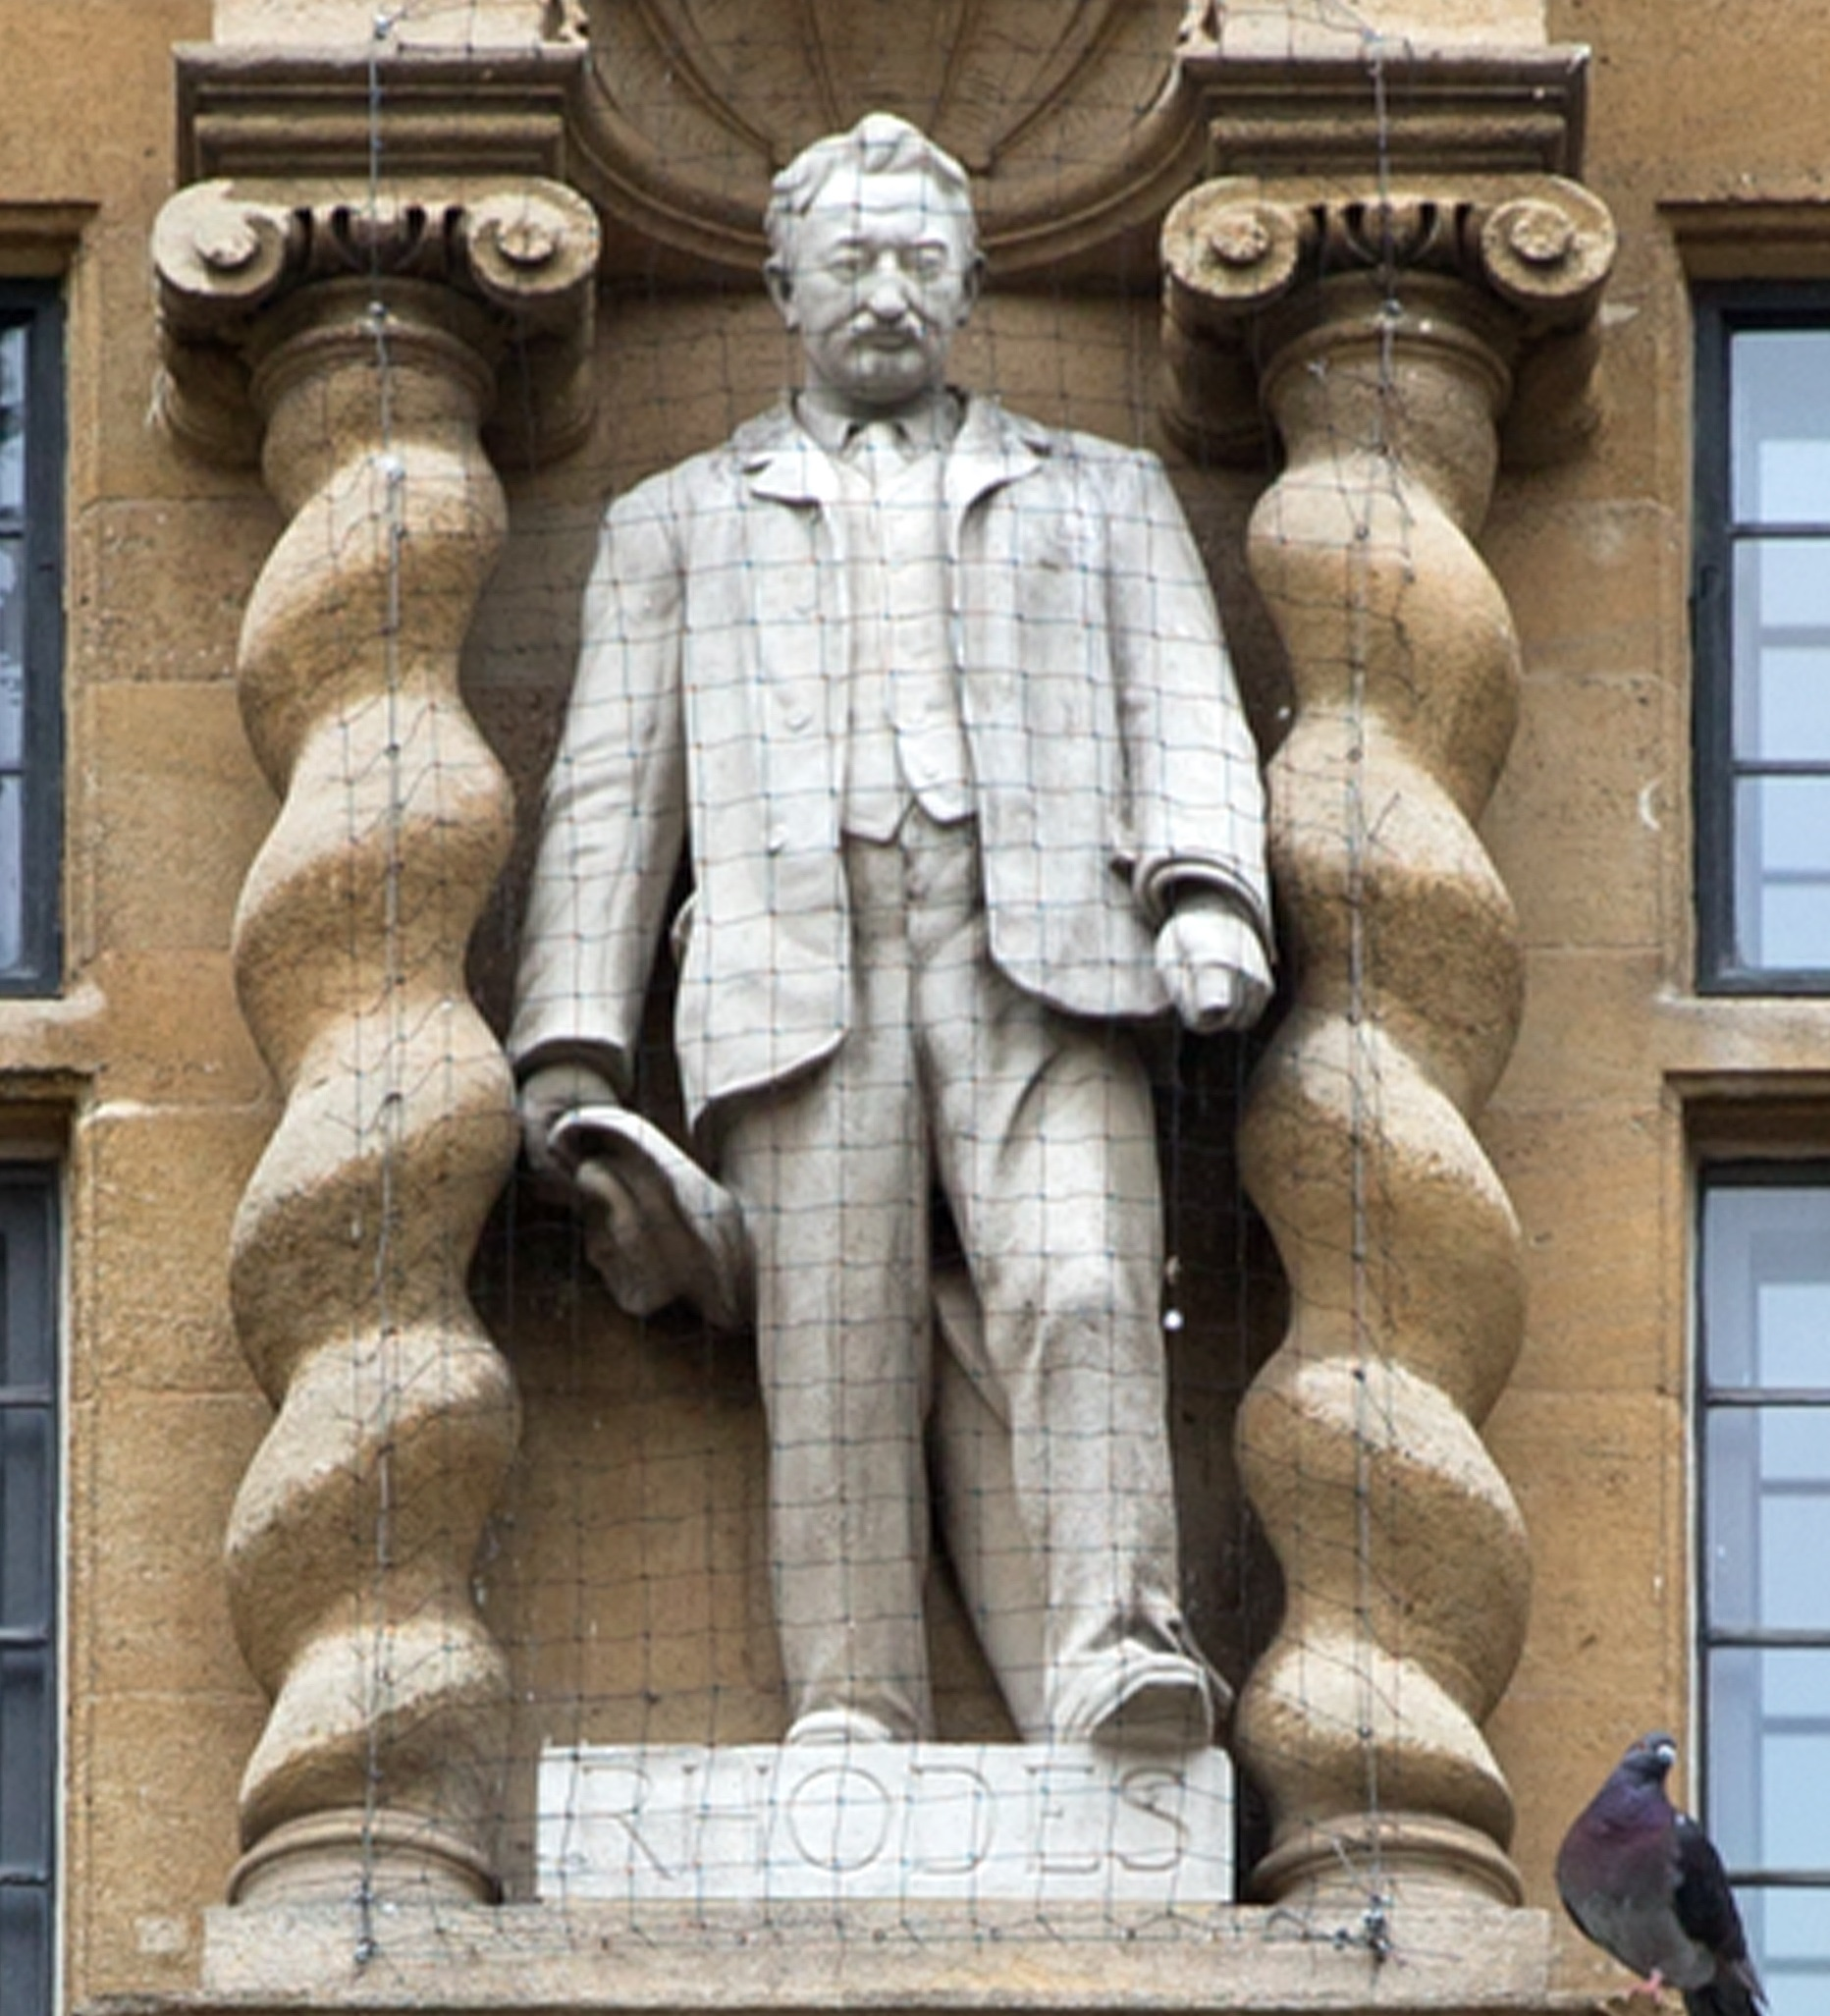 Cecil Rhodes statue at Oriel College.